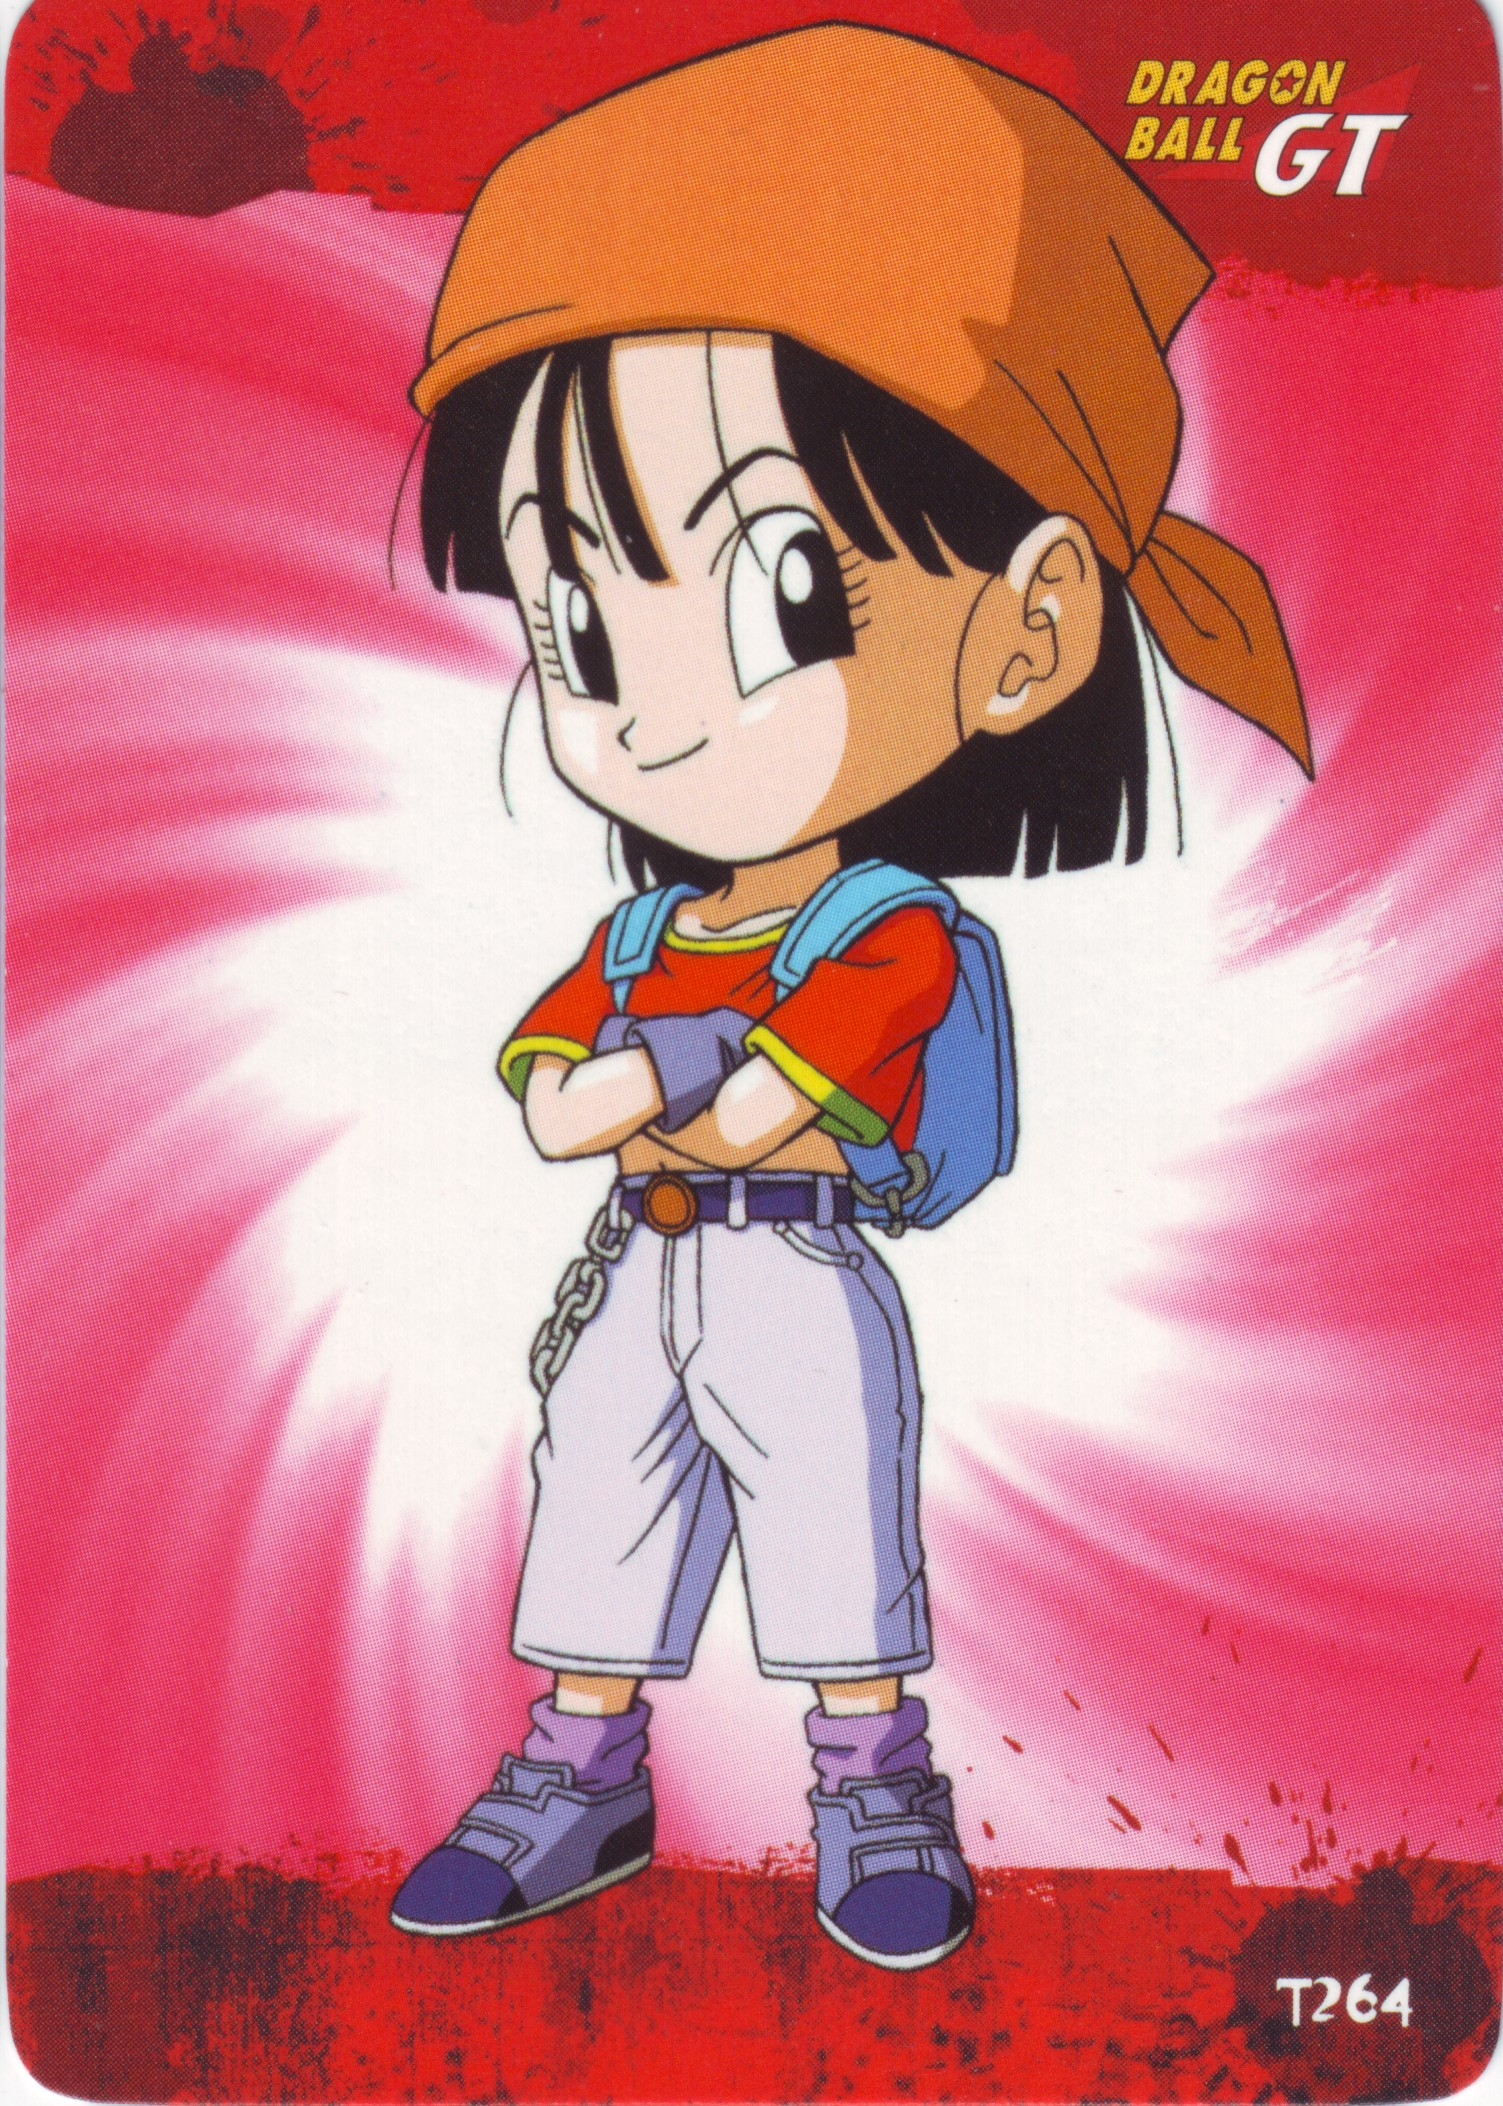 Pan (Dragon Ball Z) - Fan Fiction Wiki - You can write and